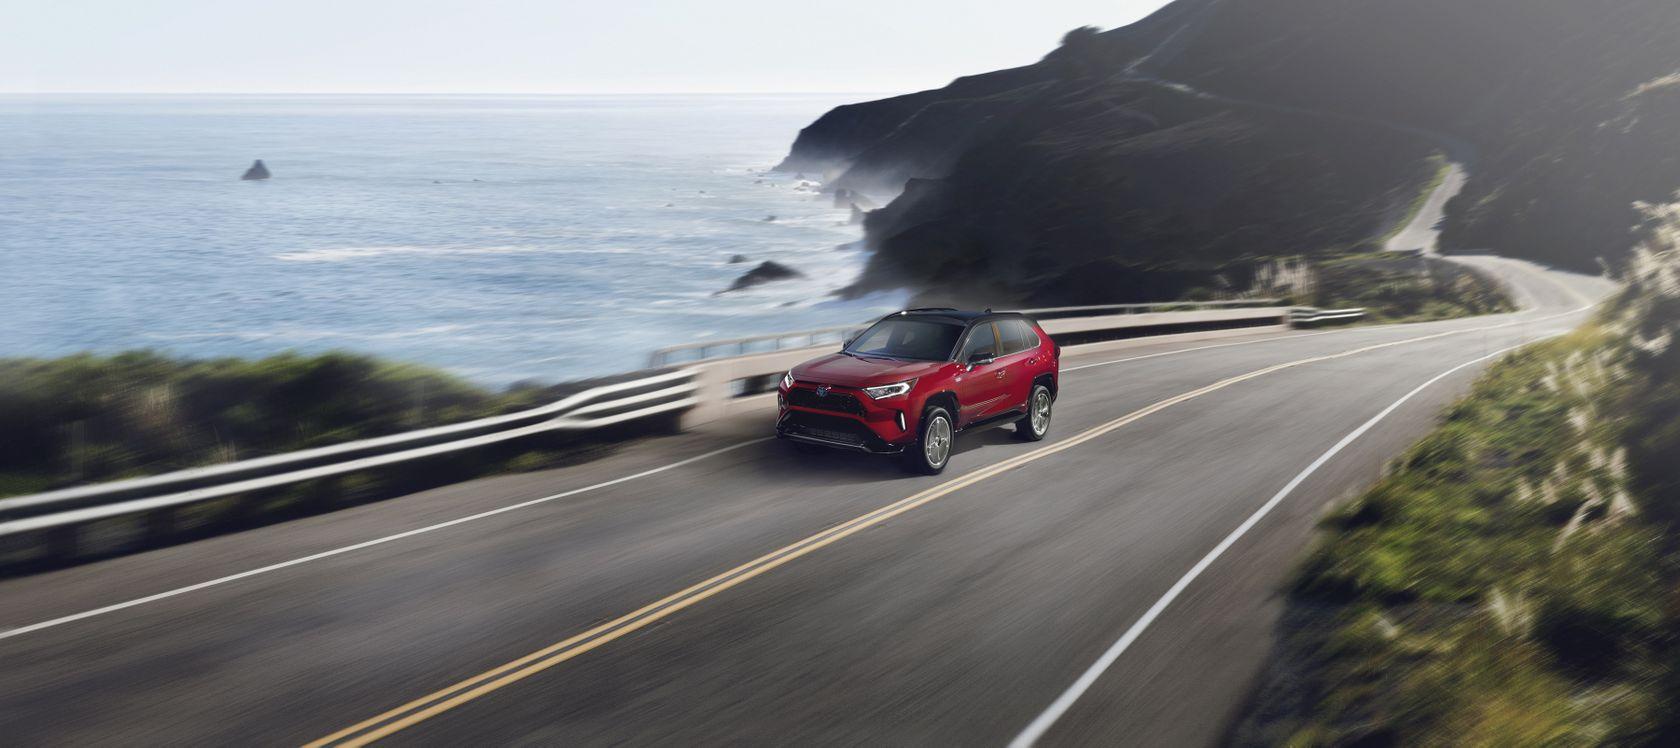 Toyota RAV4 hybride 2020 rouge sur une route pittoresque